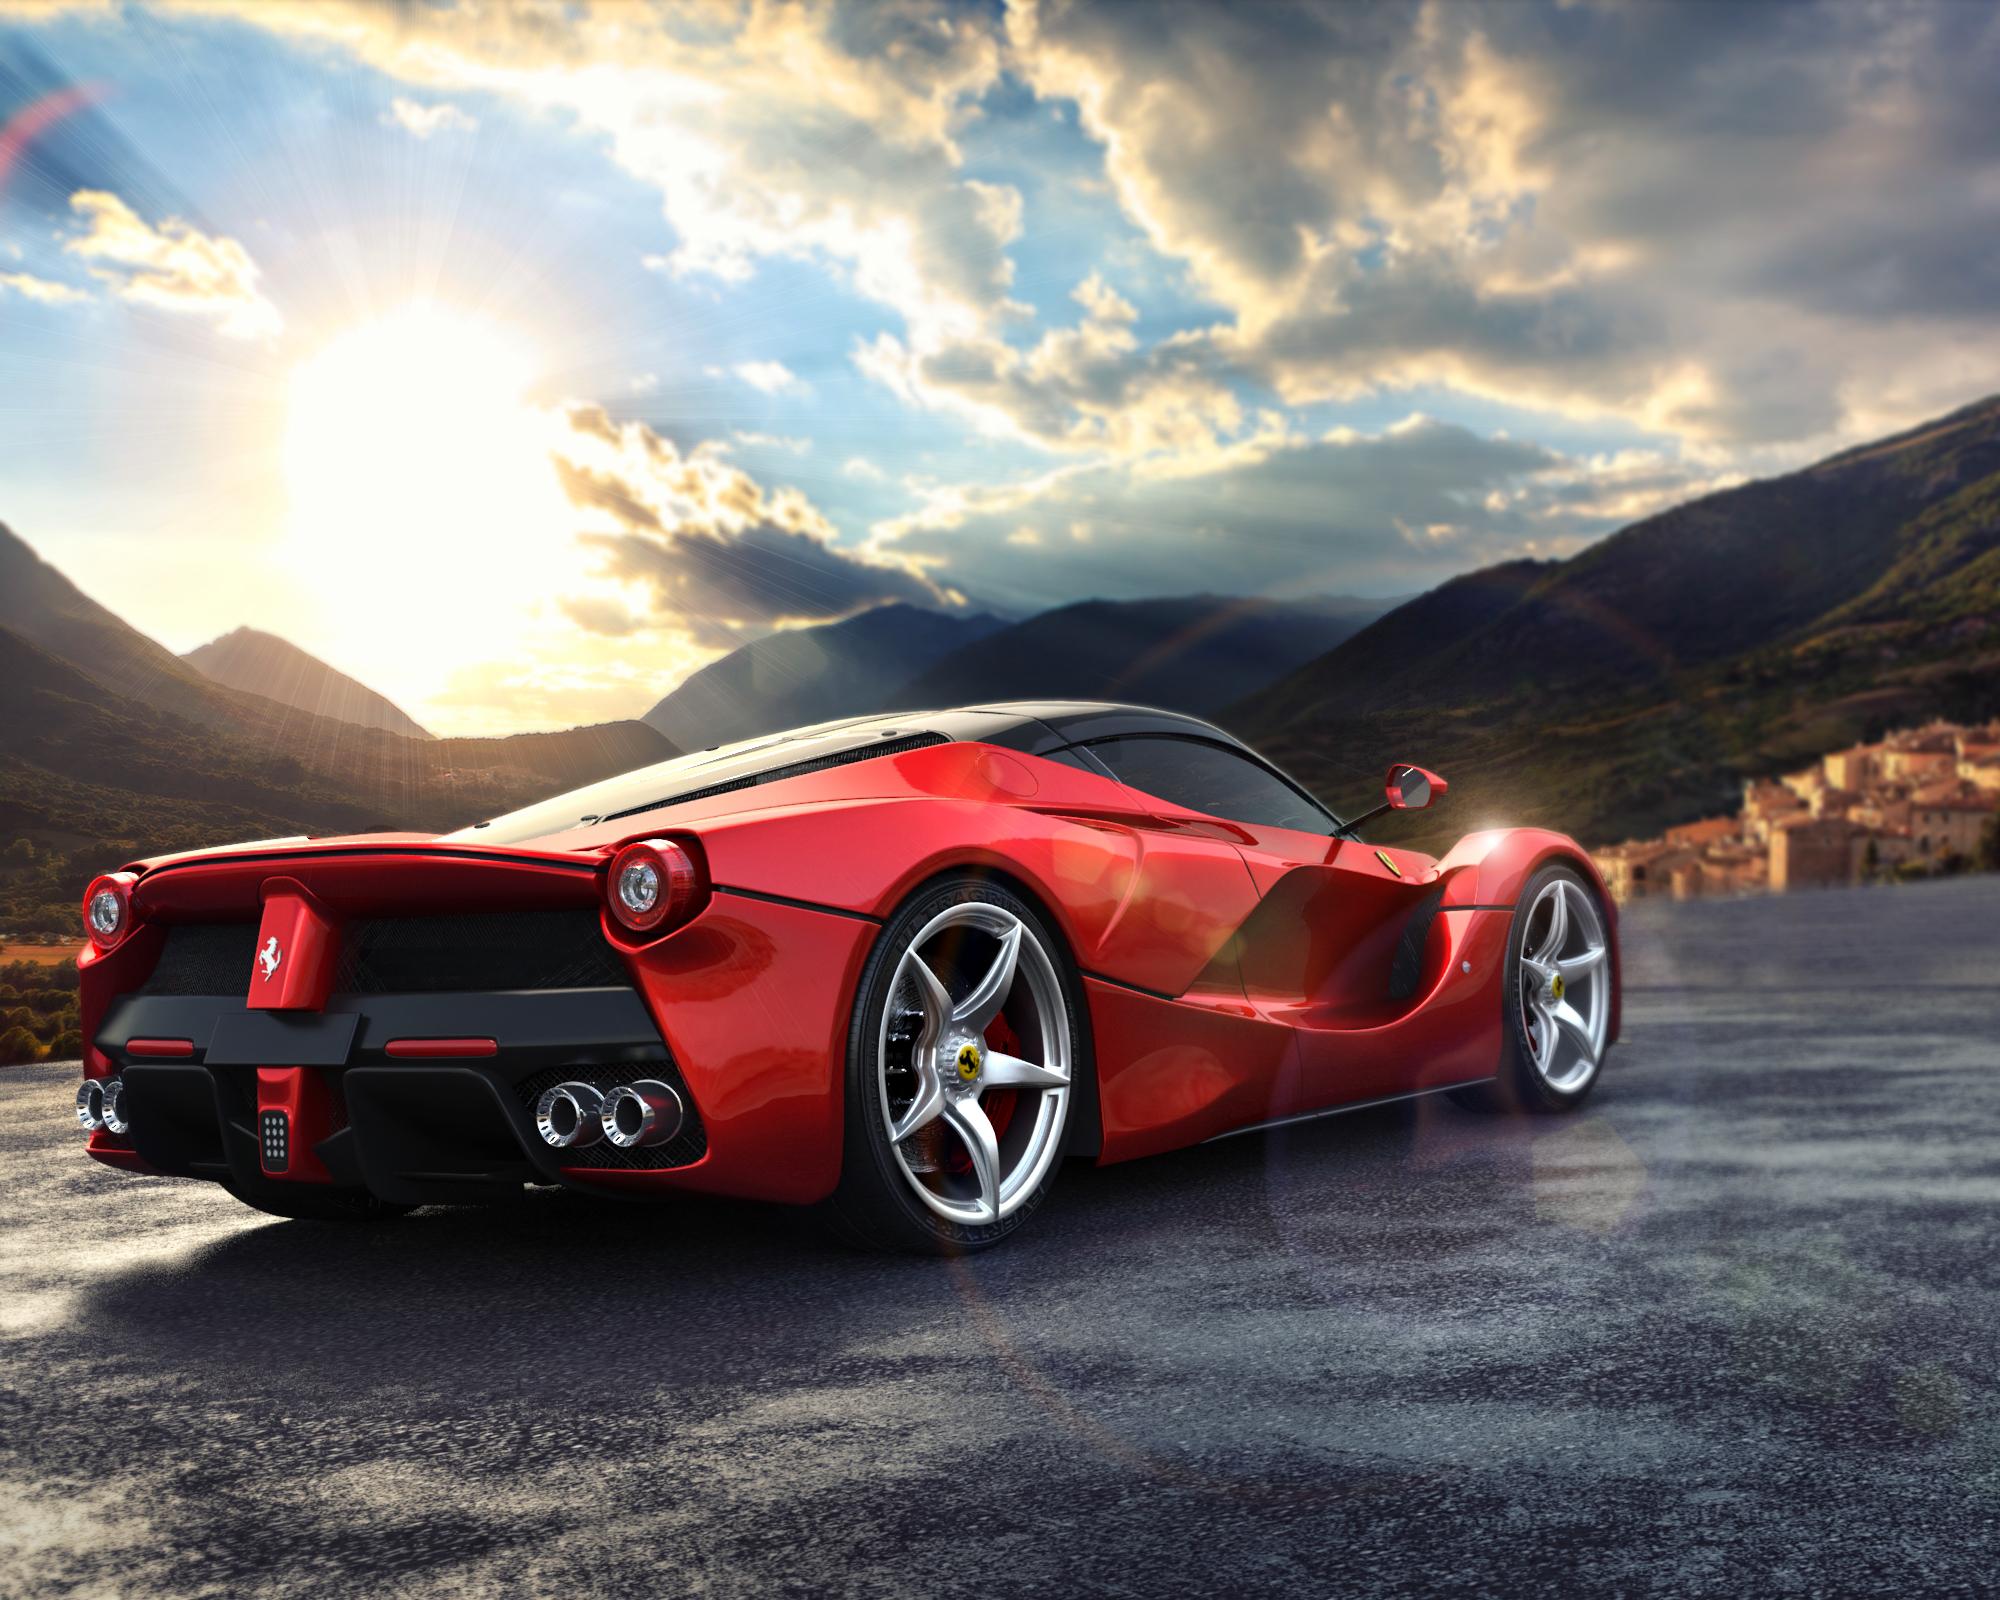 Ferrari Race Cars Hd Desktop Wallpaper